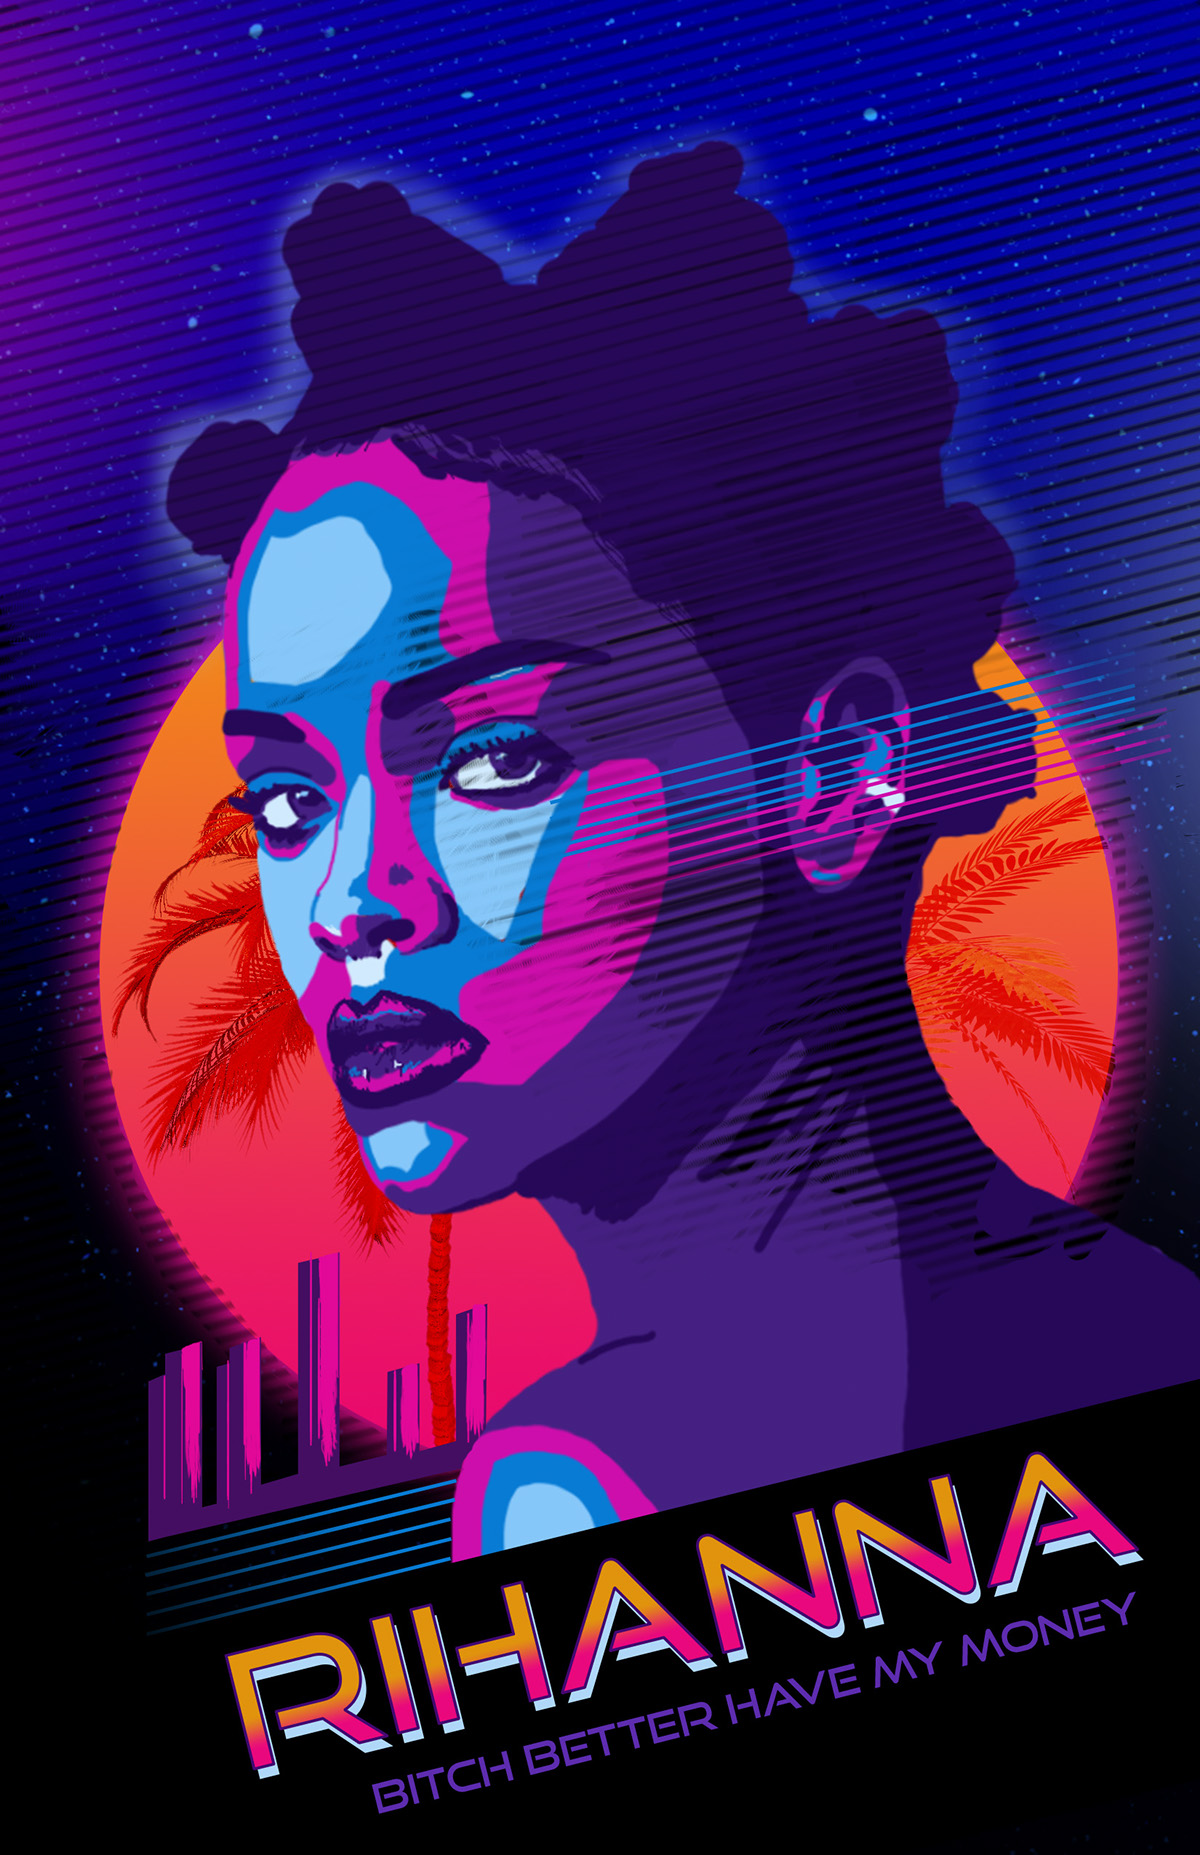 80s poster design - 80s Poster Design 23